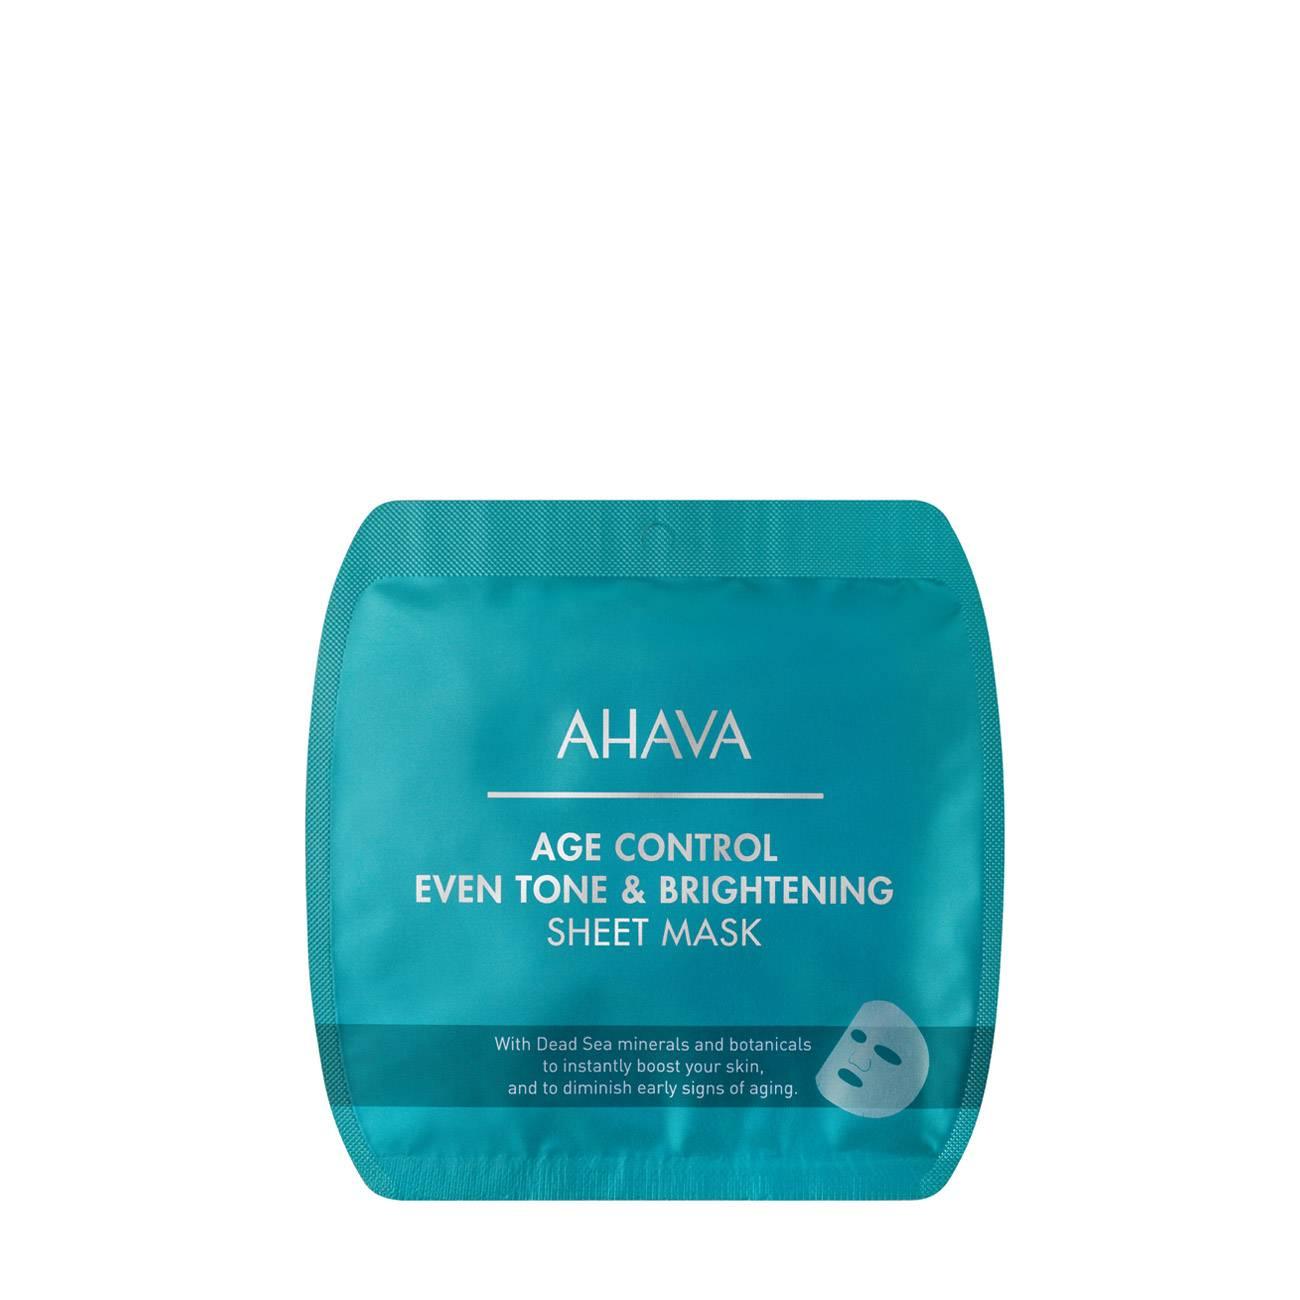 Age Control Even Tone & Brightening Sheet Mask 8 Ml Ahava imagine 2021 bestvalue.eu